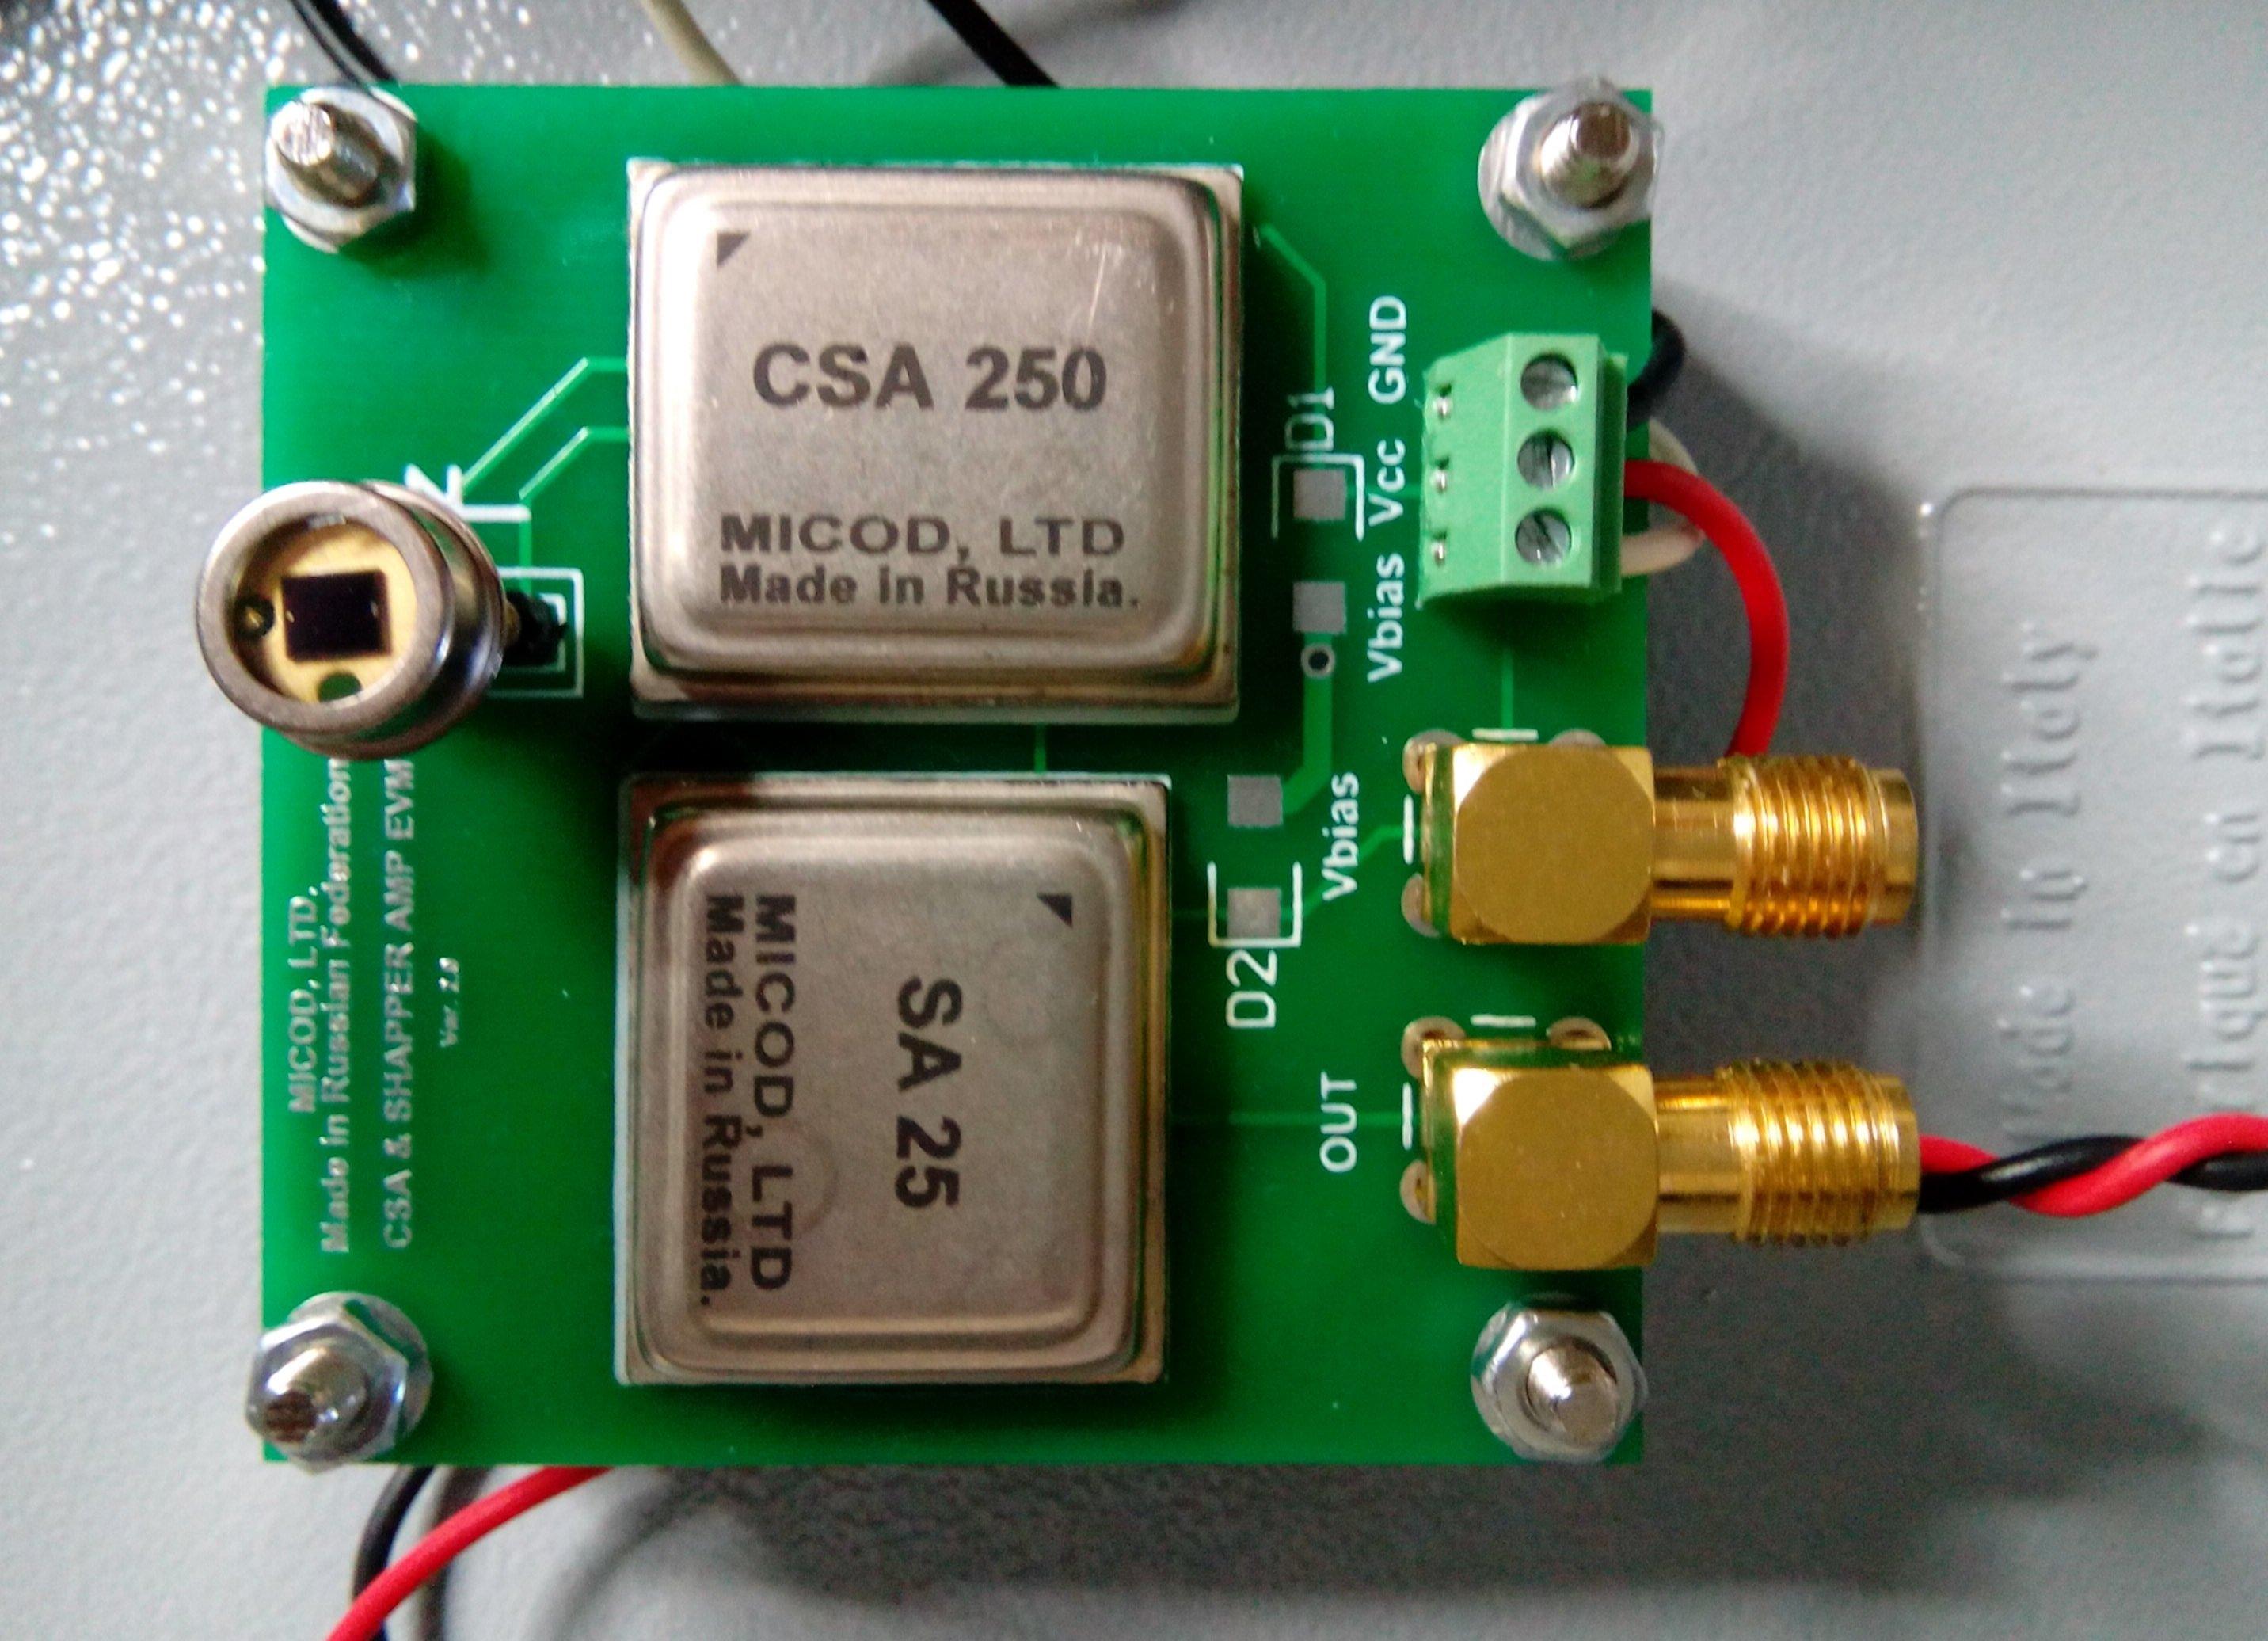 Si Pin Photodiode Plus With Csa Sa Physicsopenlab Americium Smoke Detector Circuit Board Micod